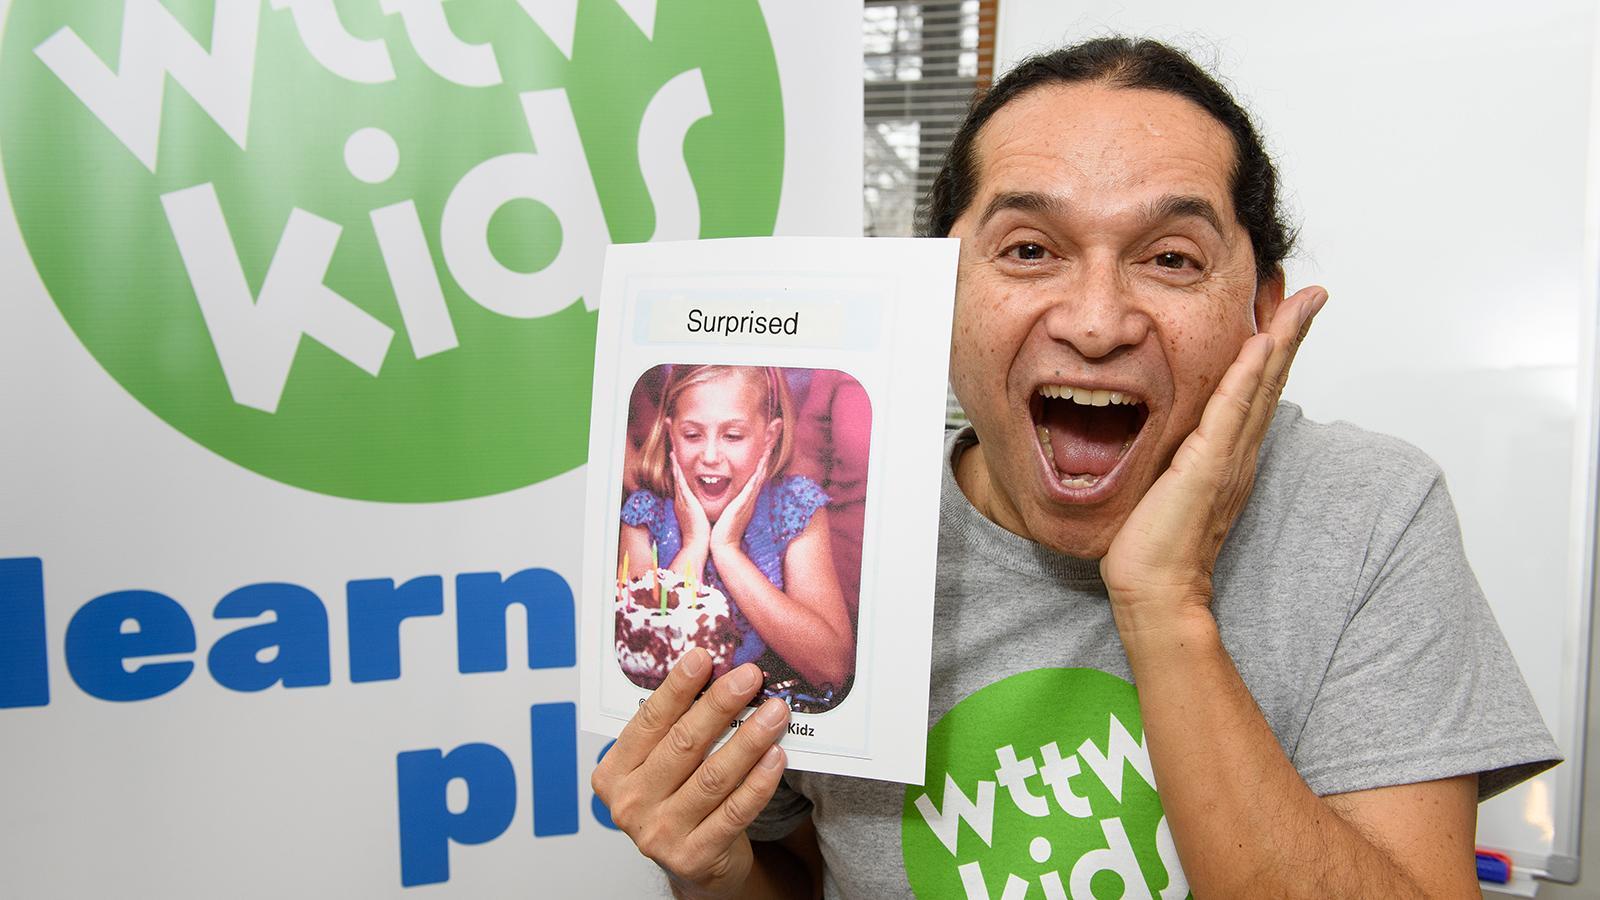 WTTW Kids Learn & Play: Make a Face